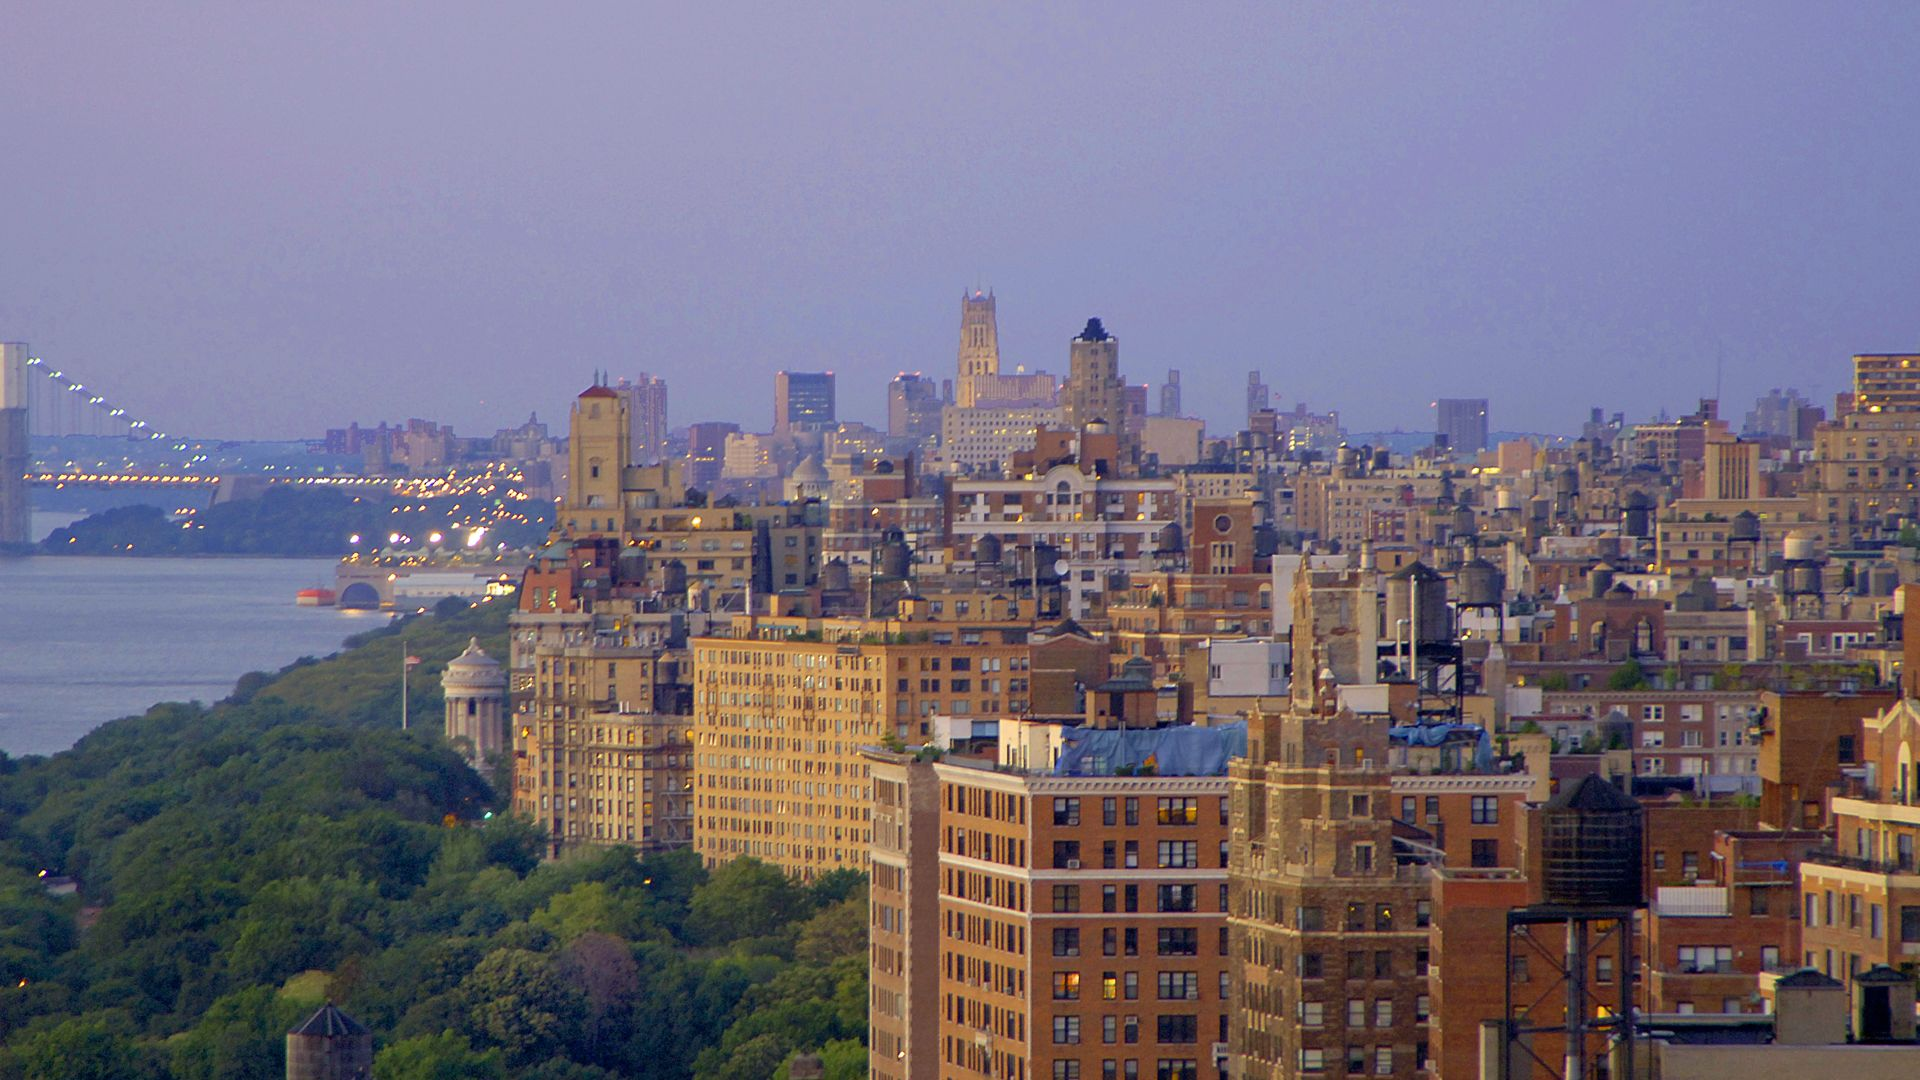 180 riverside boulevard apartments 180 riverside for The riverside